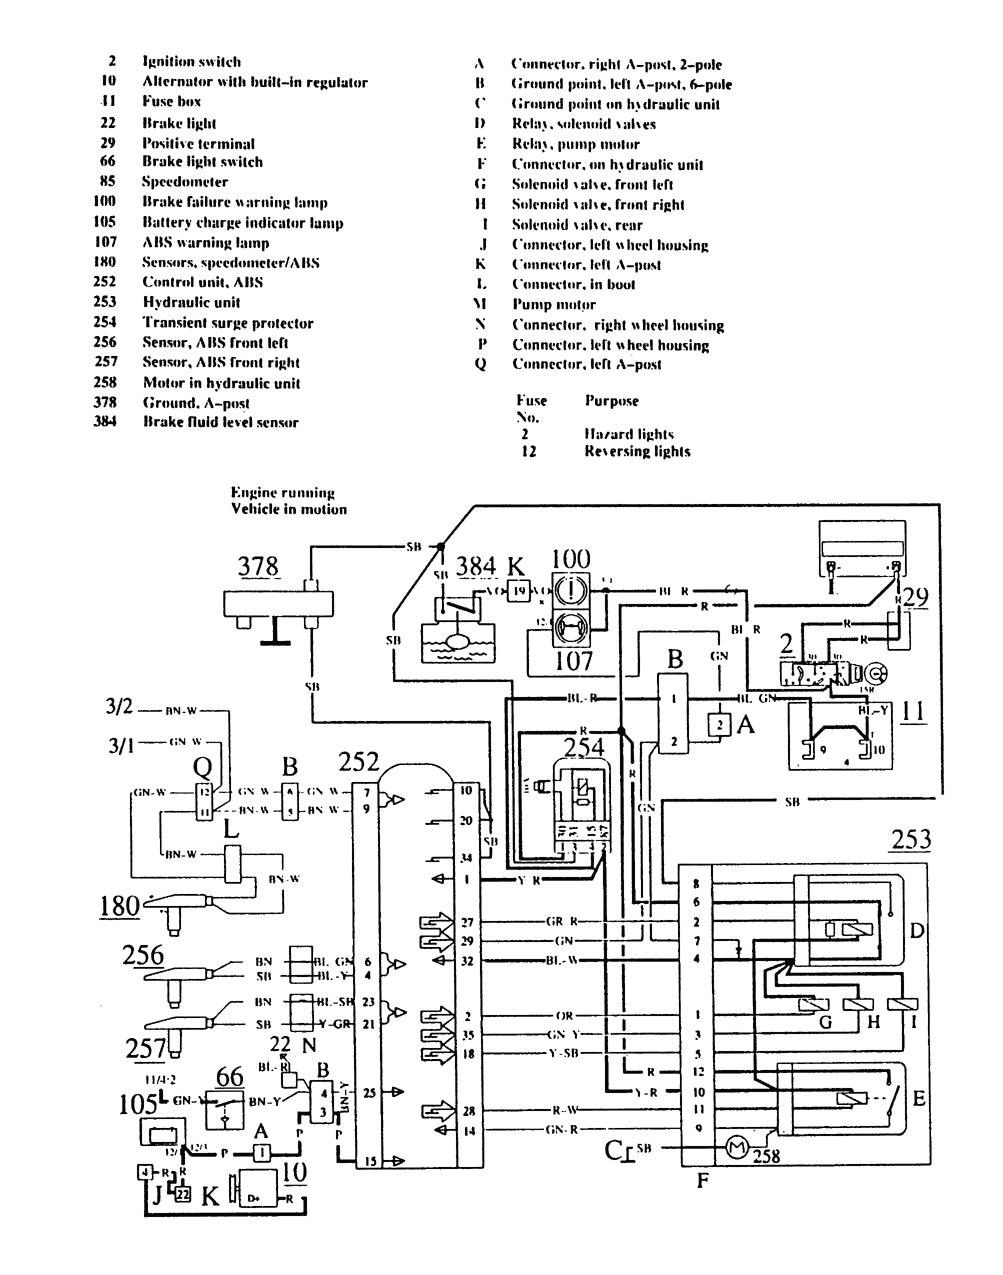 volvo 240 ignition wiring house wiring diagram symbols u2022 1993 volvo 240 radio wiring volvo